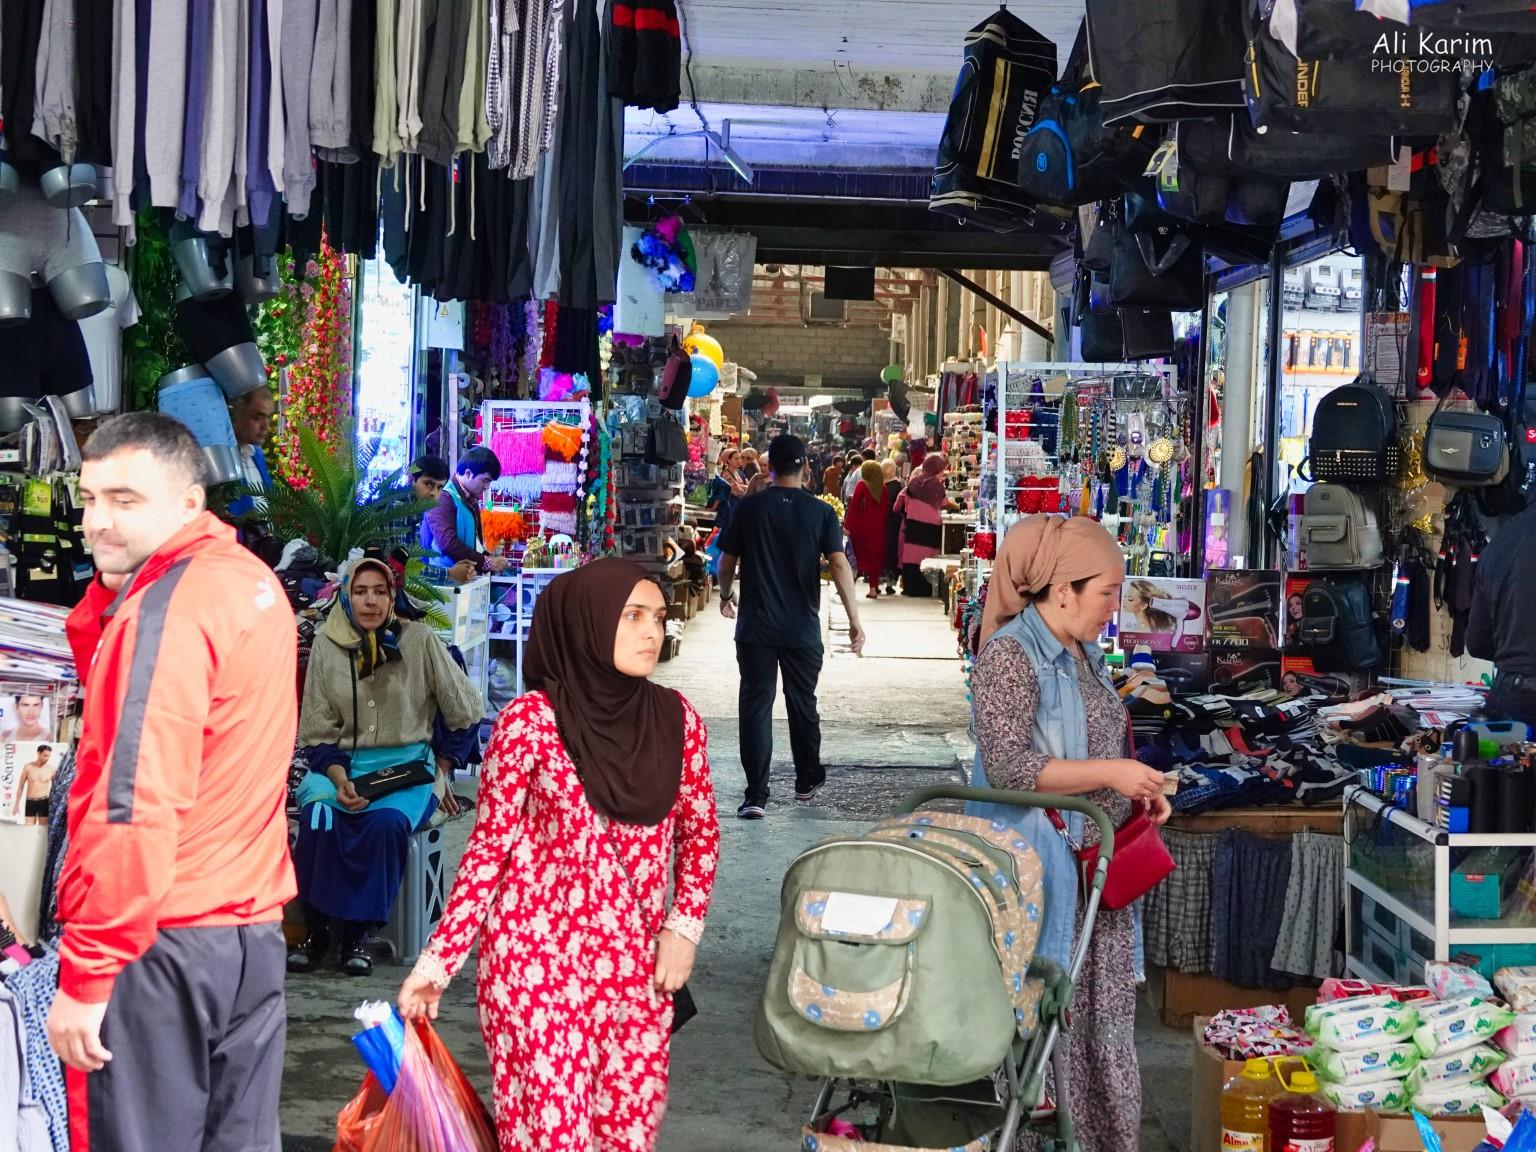 More Dushanbe, Tajikistan Many small shops selling clothing etc